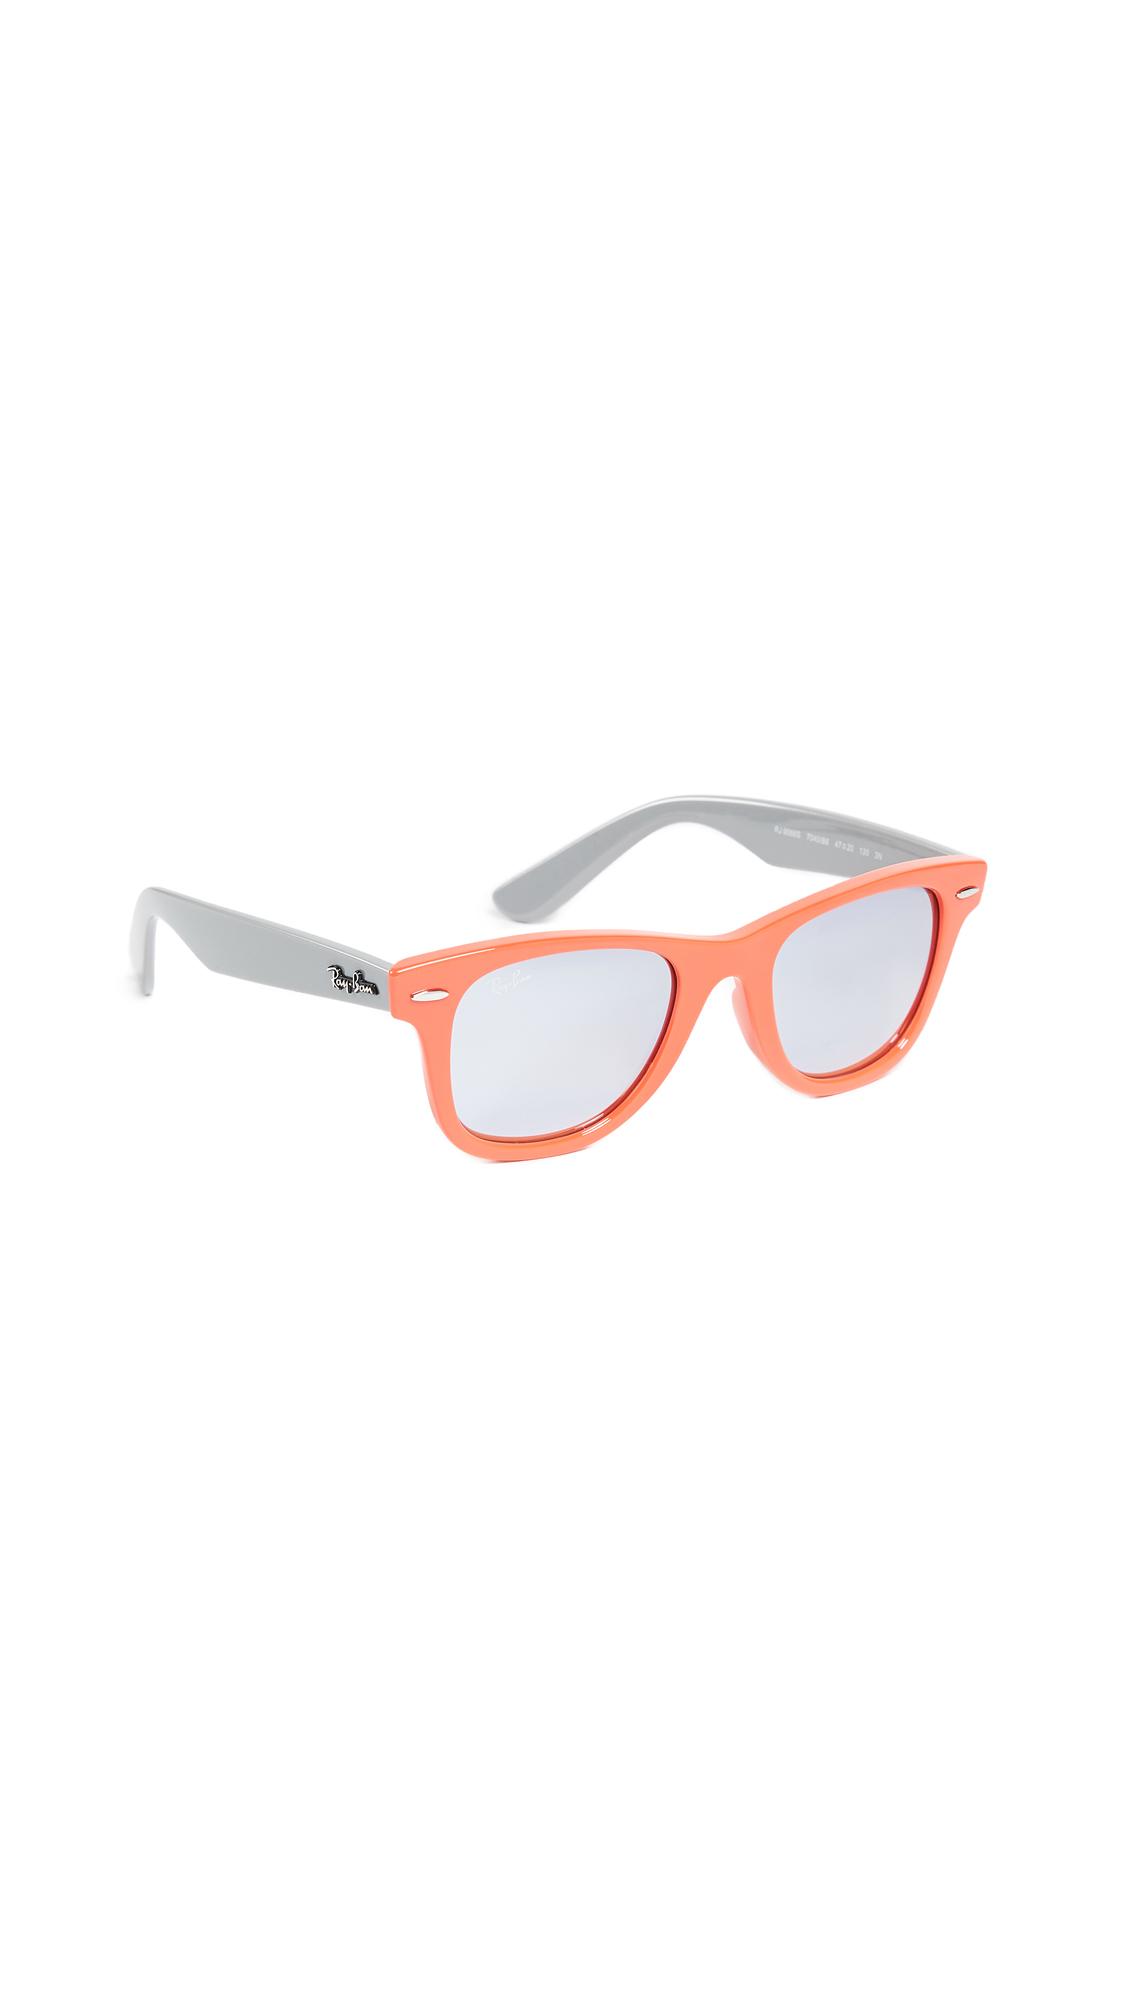 Ray-Ban Childs Wayfarer Sunglasses - Coral/Silver